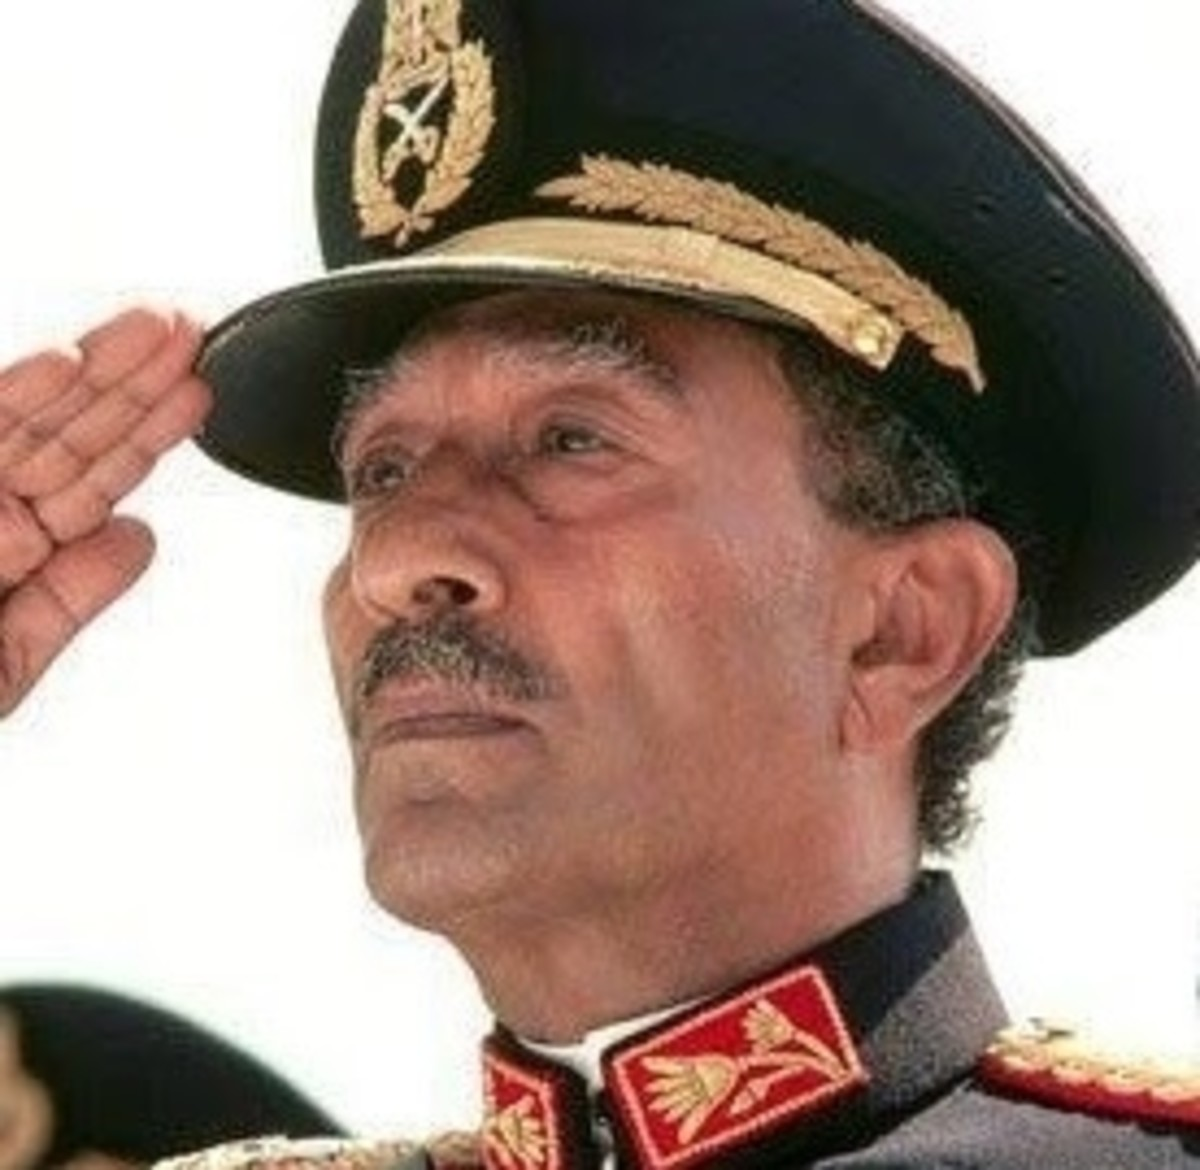 Egypt President Muhammad Anwar El-Sadat